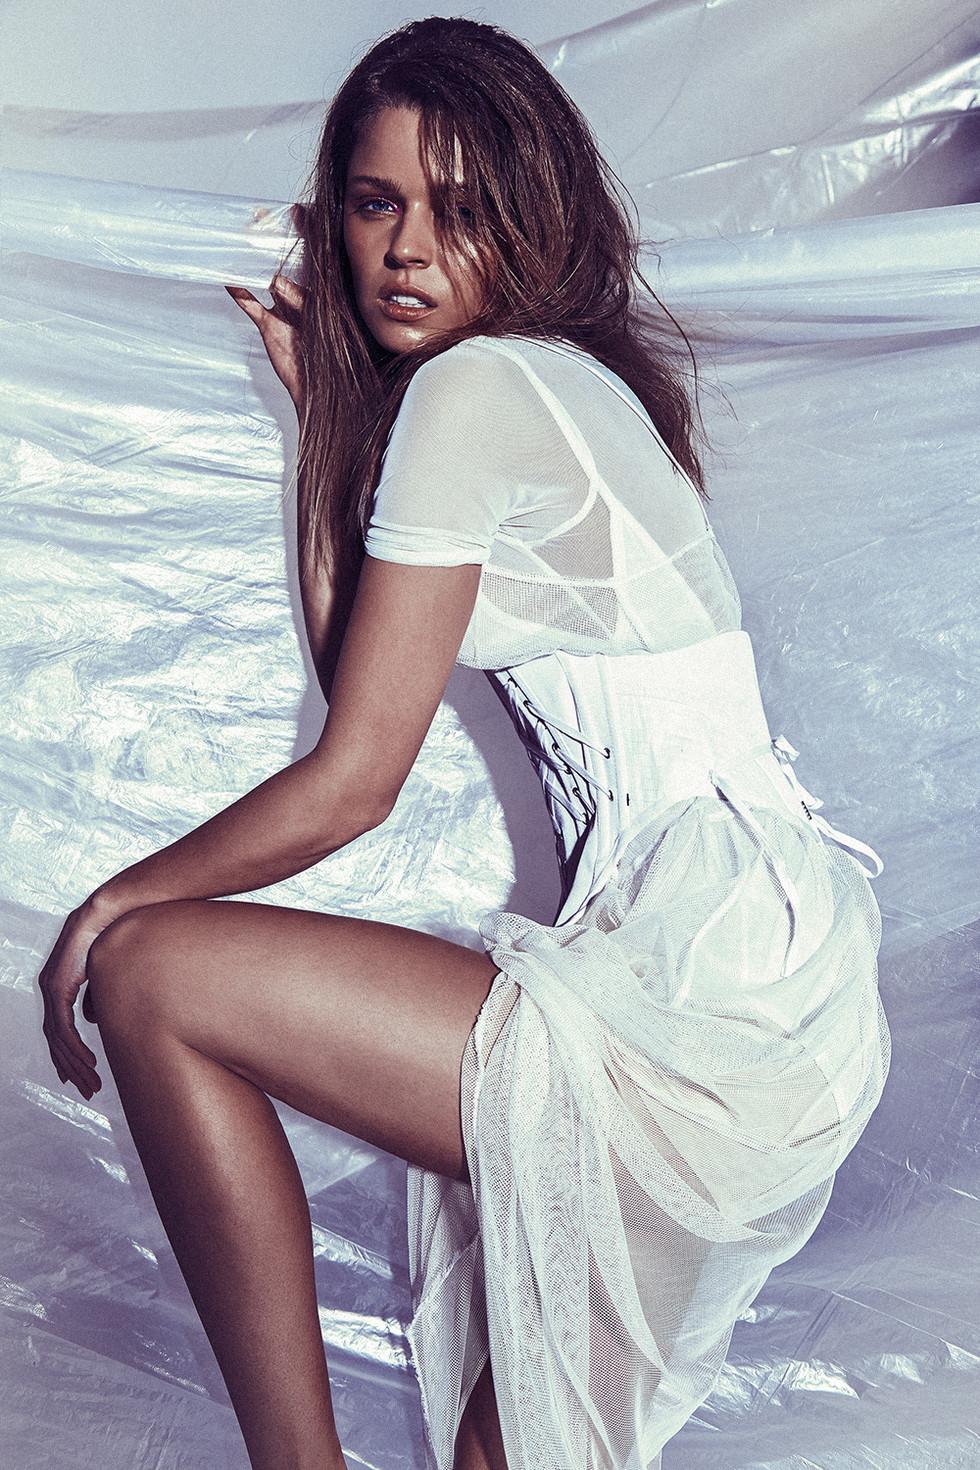 SHUSTRING MAGAZINE | Photo - Bernard Gueit | Model - Juliana Forge | Hair - Nic Santoyo | MUA - Leonie Karagiannis